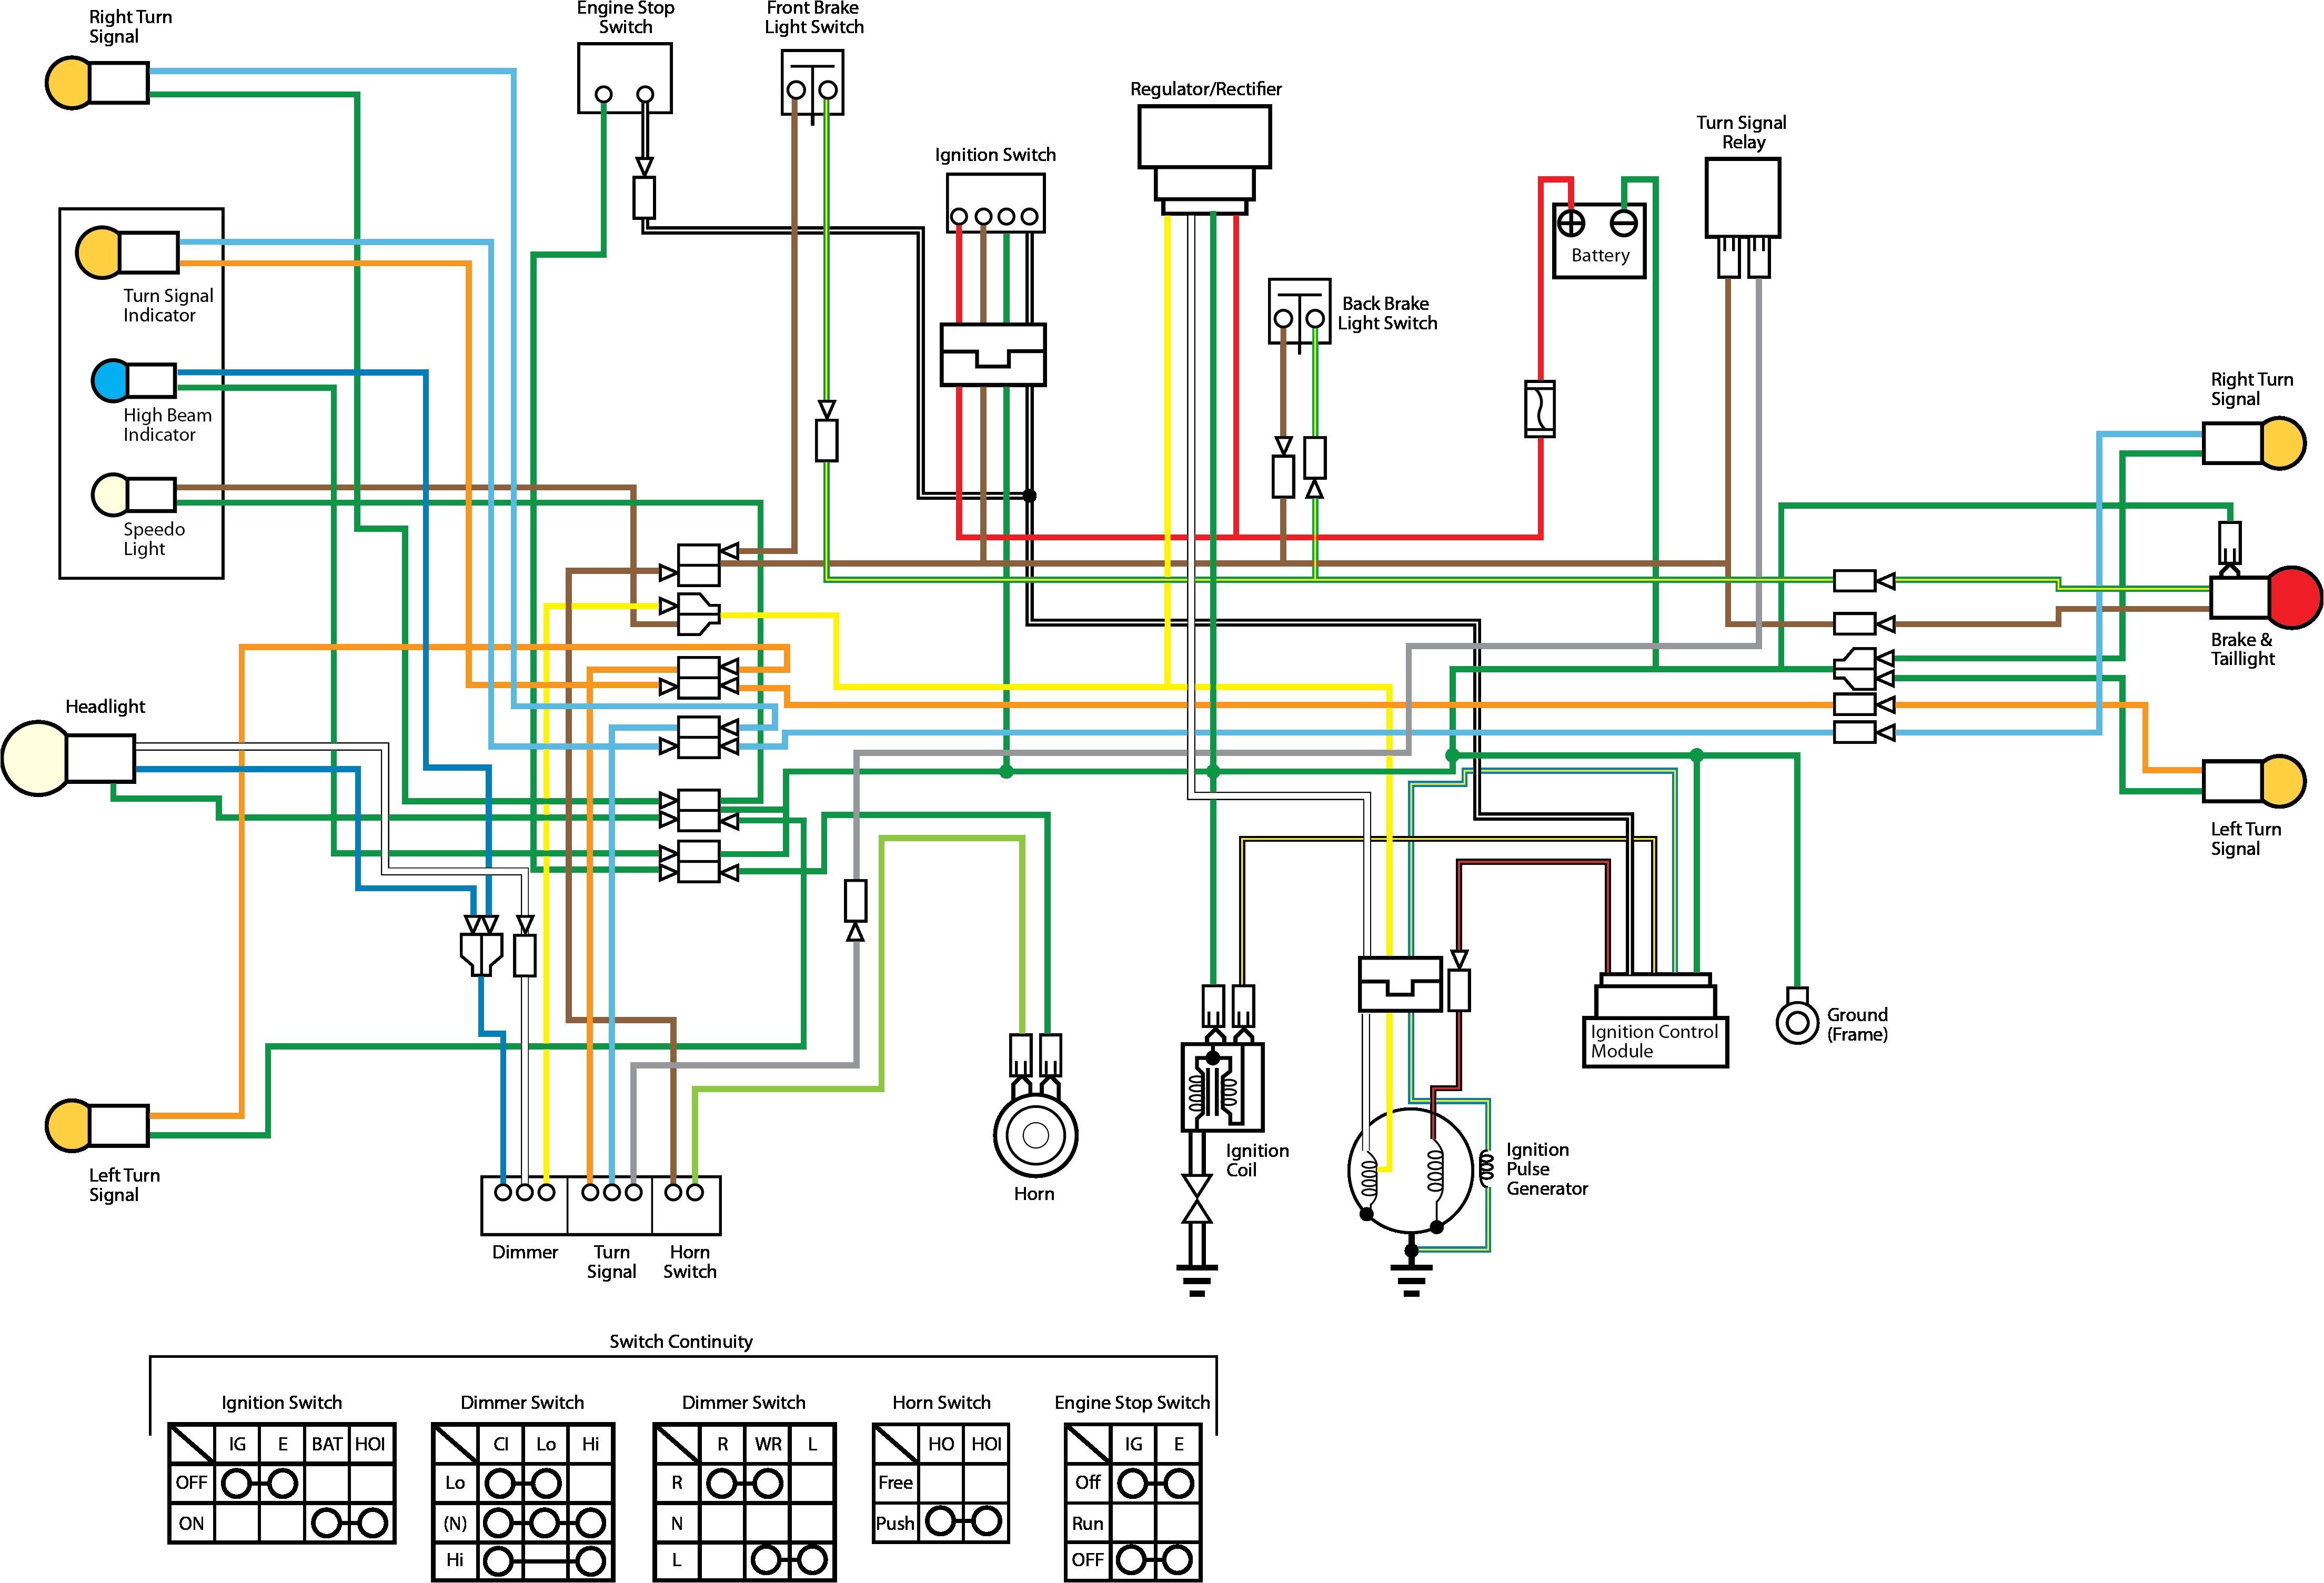 Honda Accord Stereo Wiring Diagram 2005 Honda Accord Wiring Diagrams Wiring Diagram User